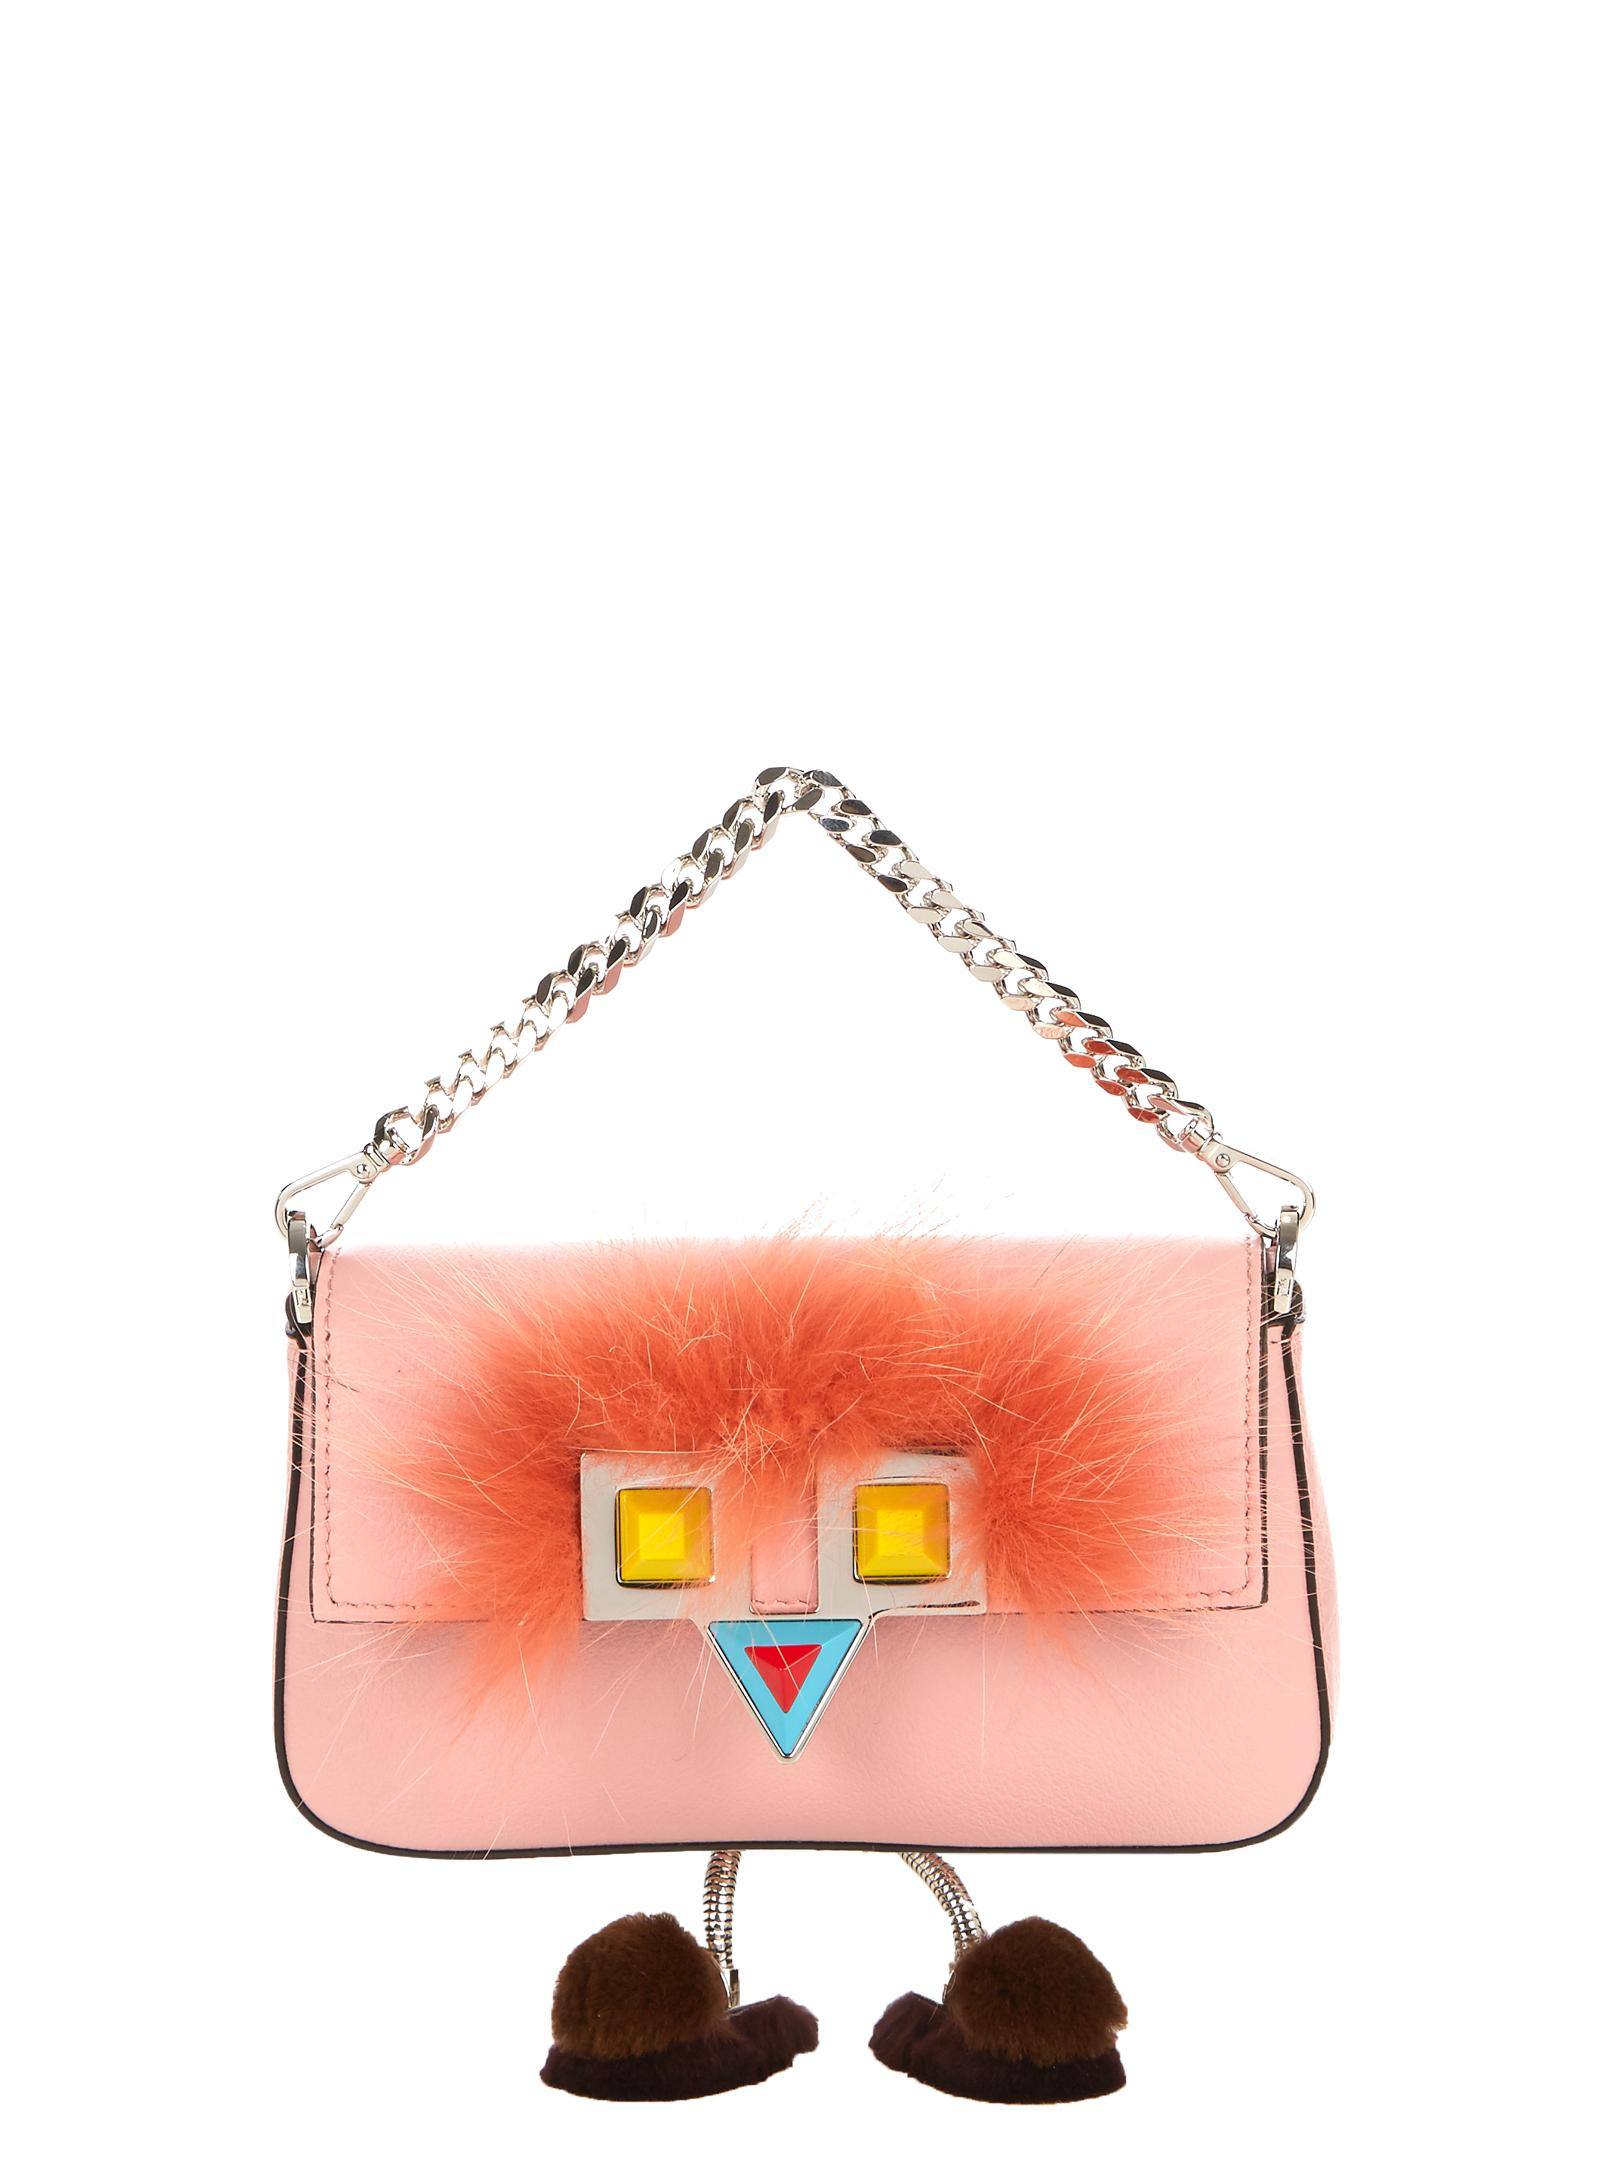 834f9893410 Fendi Micro Baguette Fur-embellished Cross-body Bag in Pink - Lyst